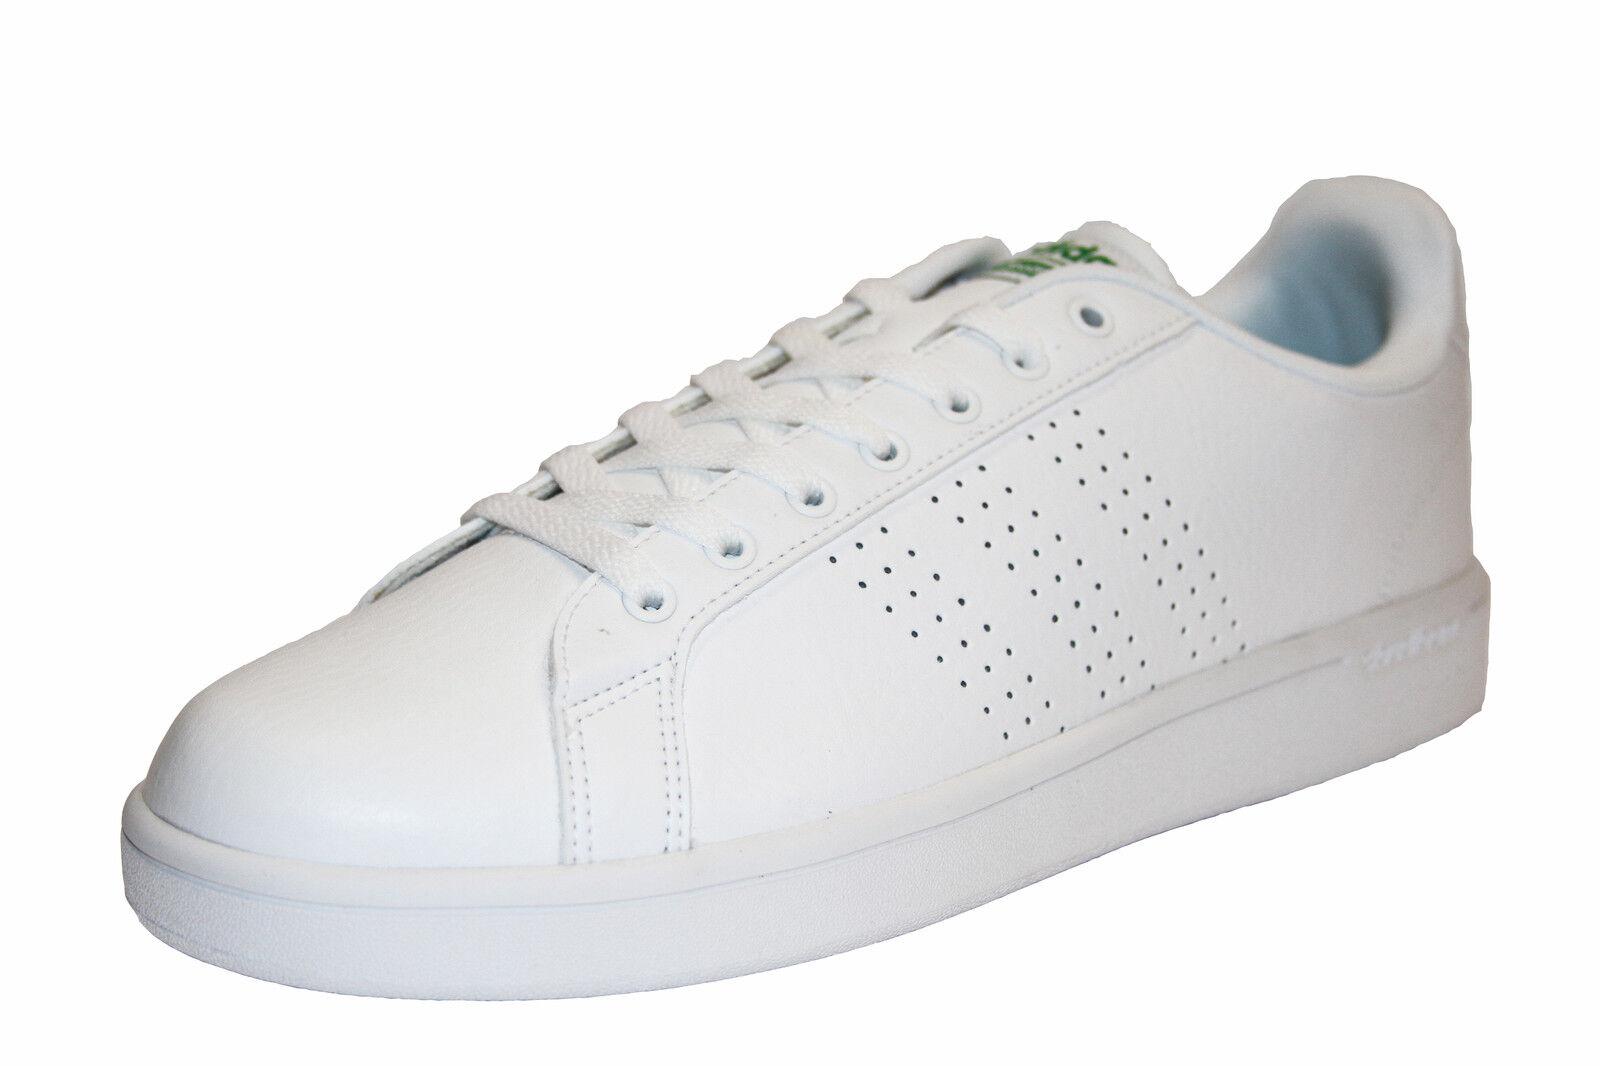 new product fdf05 12af1 Adidas Adizero PrimeKnit Beijing Marathon Prime Bleu Running,